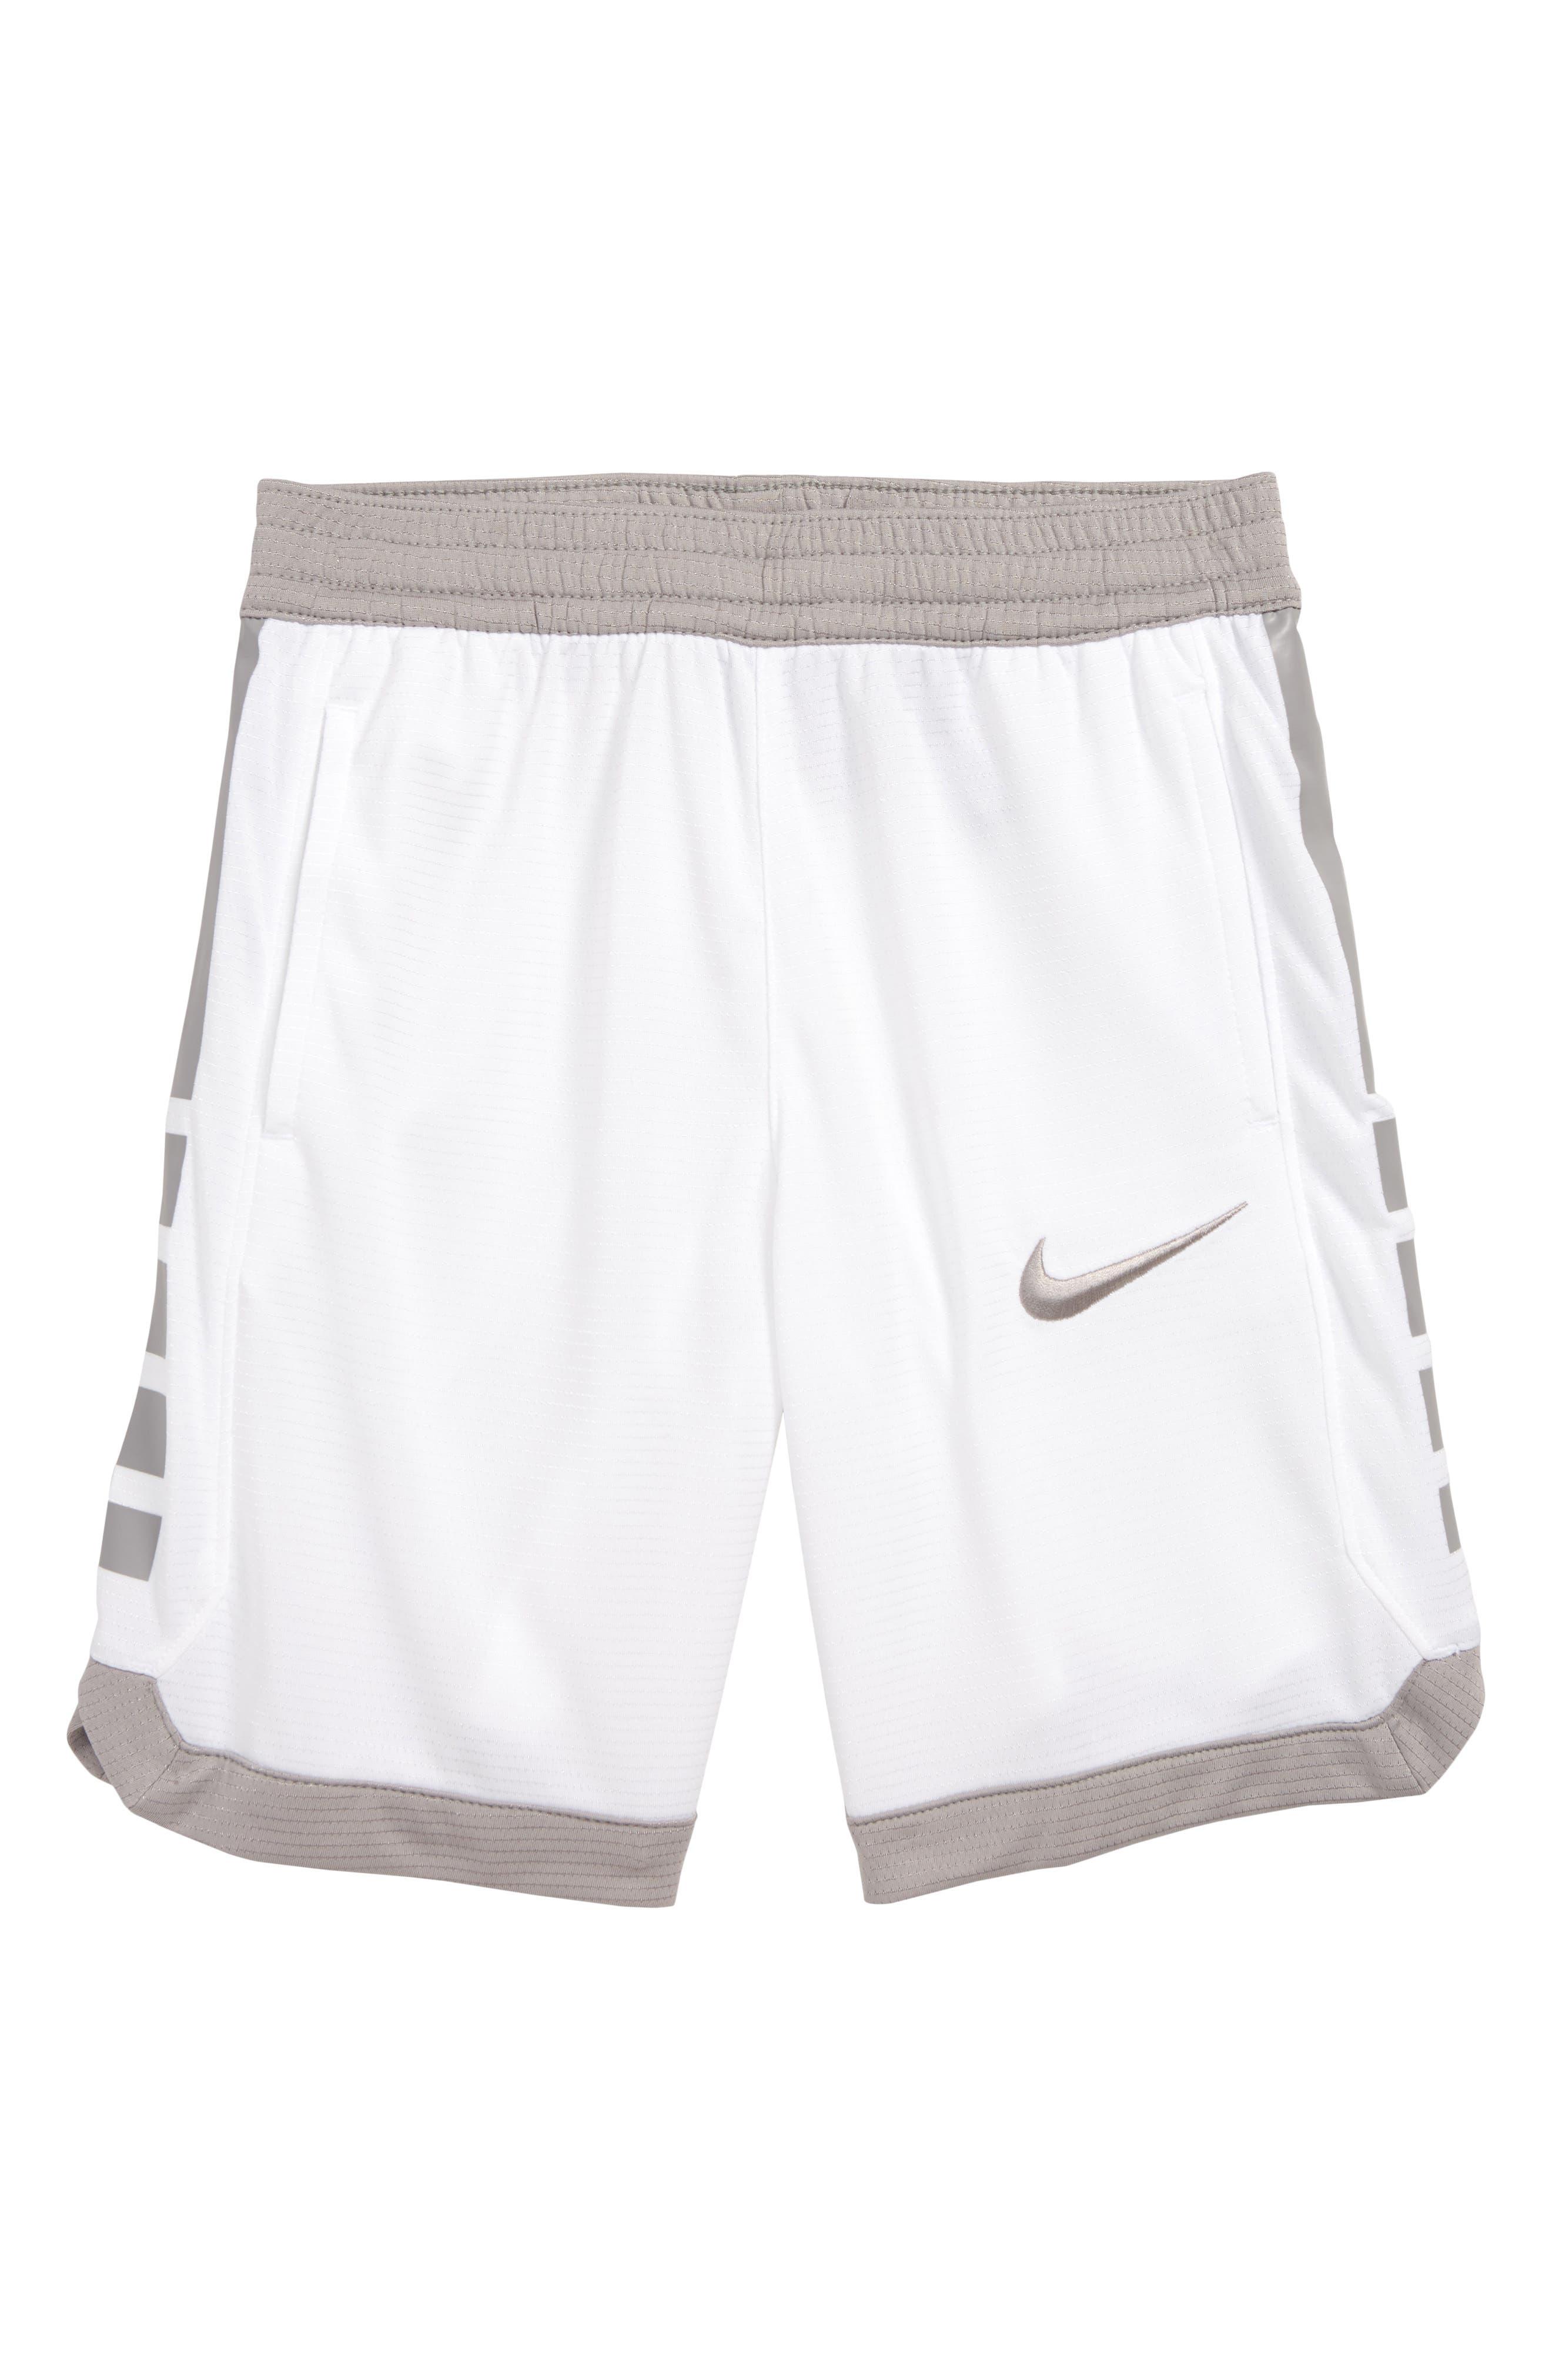 Boys Nike Dry Elite Stripe Athletic Shorts Size 7  White